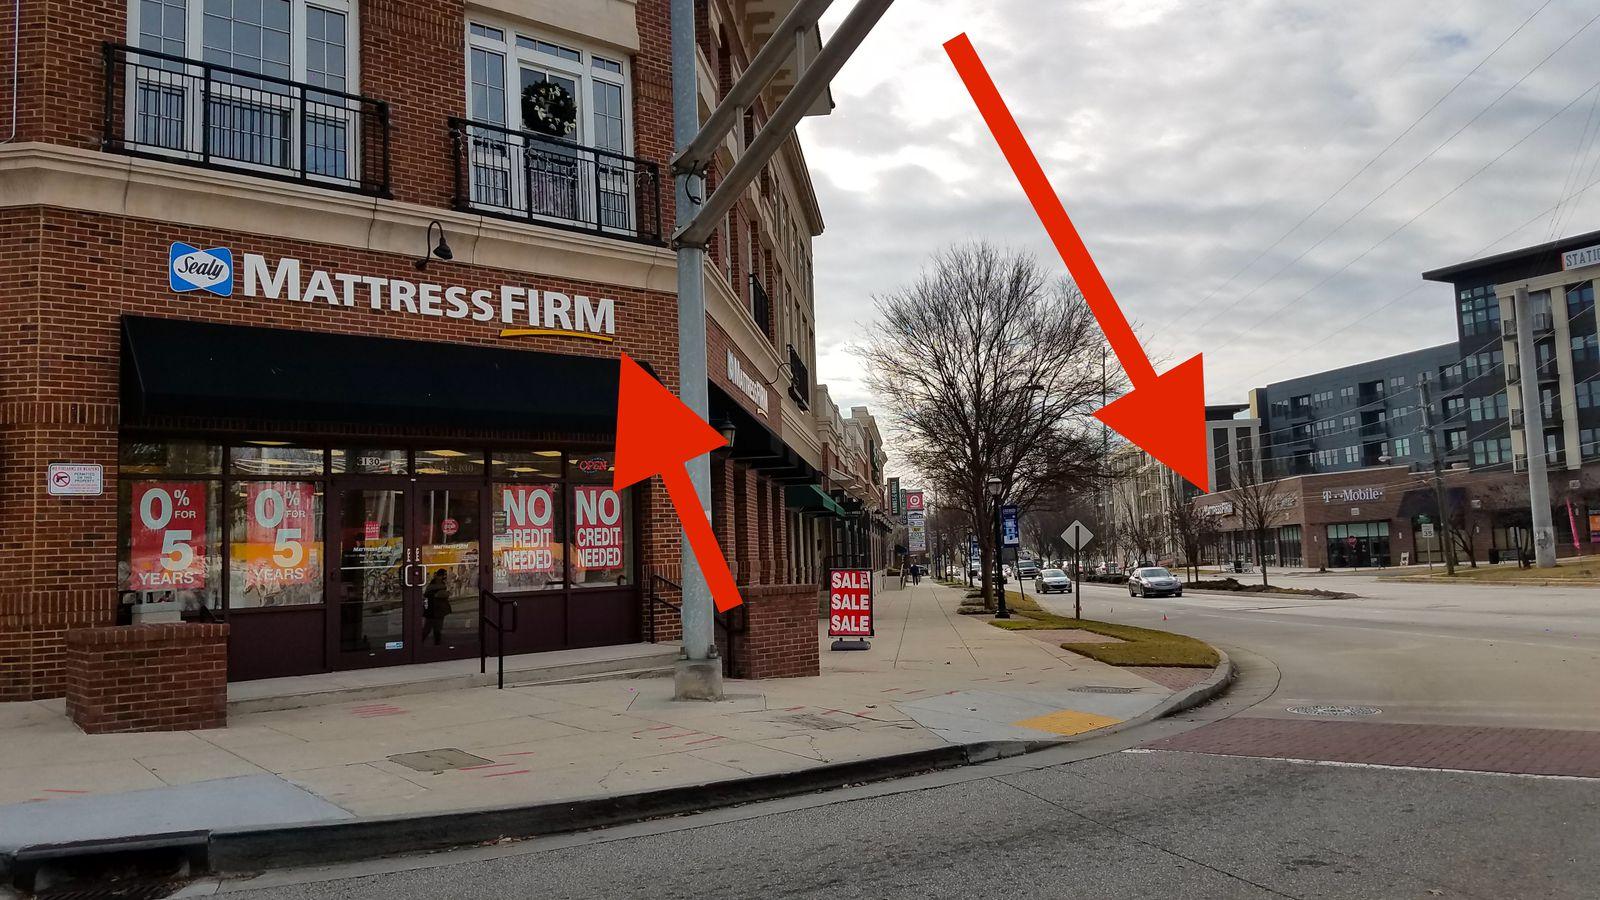 Atlanta S Double Dose Of Mattress Firms On Same Street An